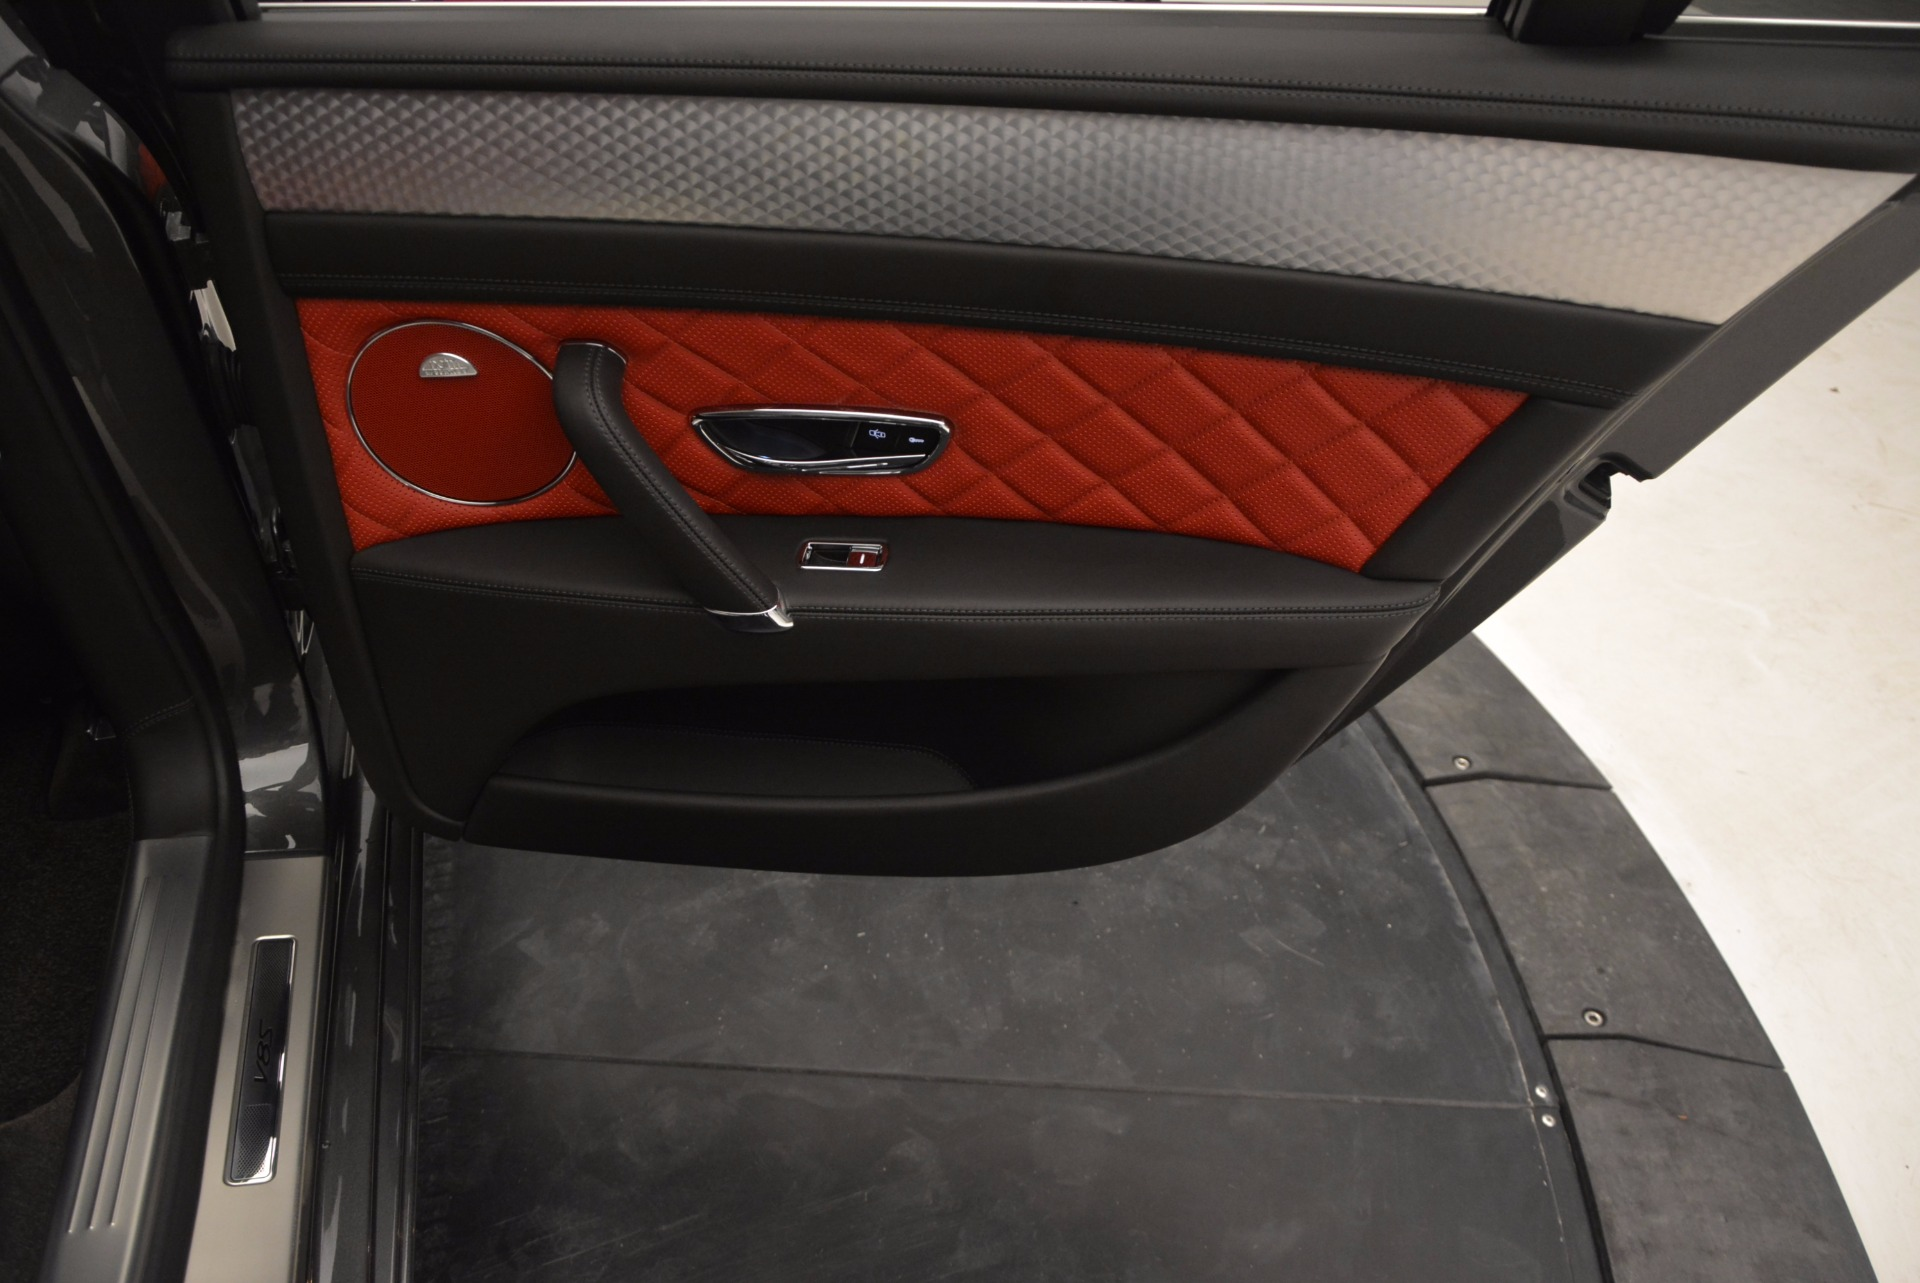 Used 2017 Bentley Flying Spur V8 S For Sale In Westport, CT 875_p48